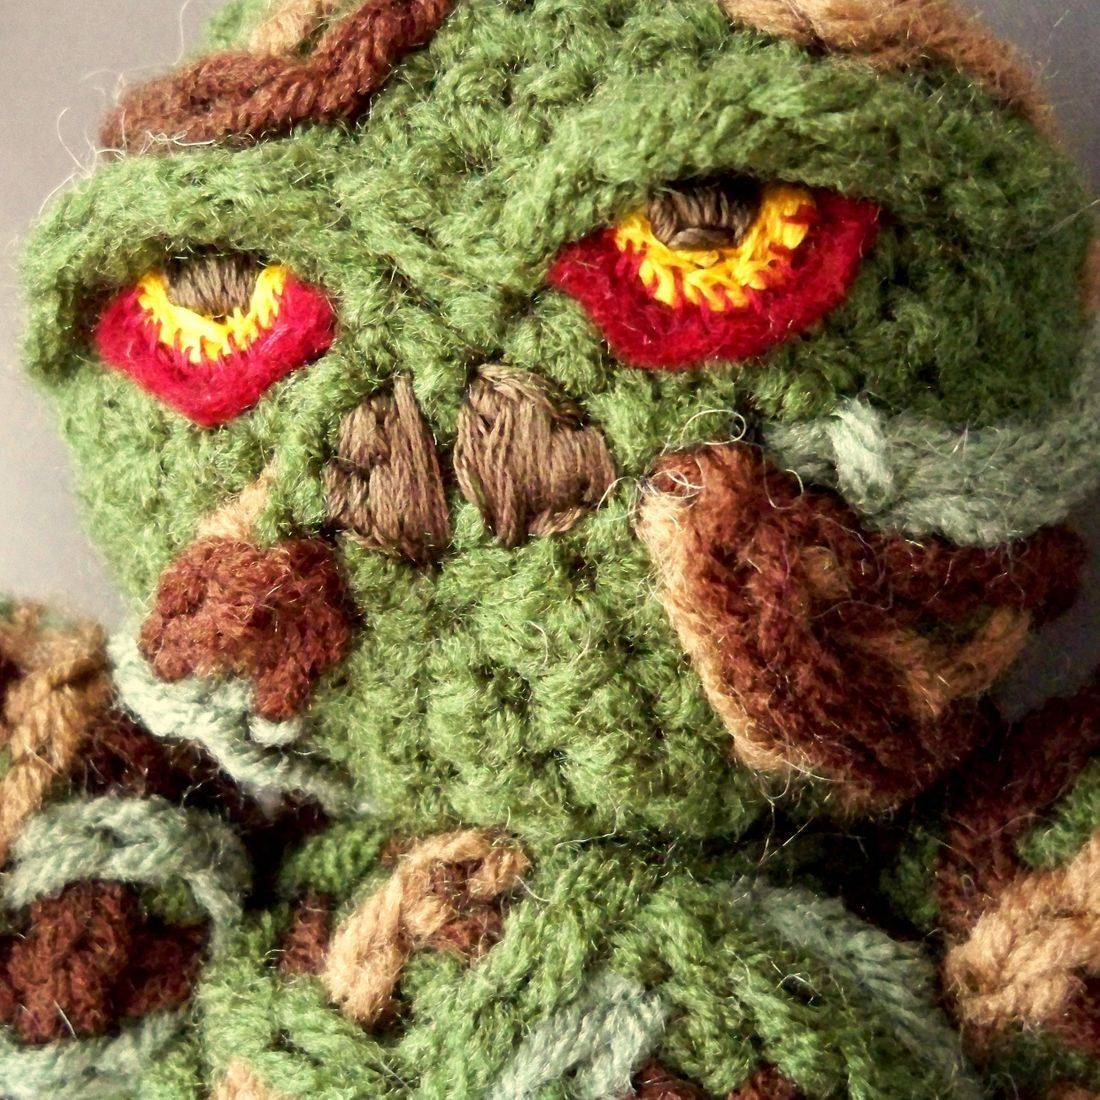 Swamp Thing, comicbook, amigurumi, plush, doll, nerd, geek, handmade, crochet